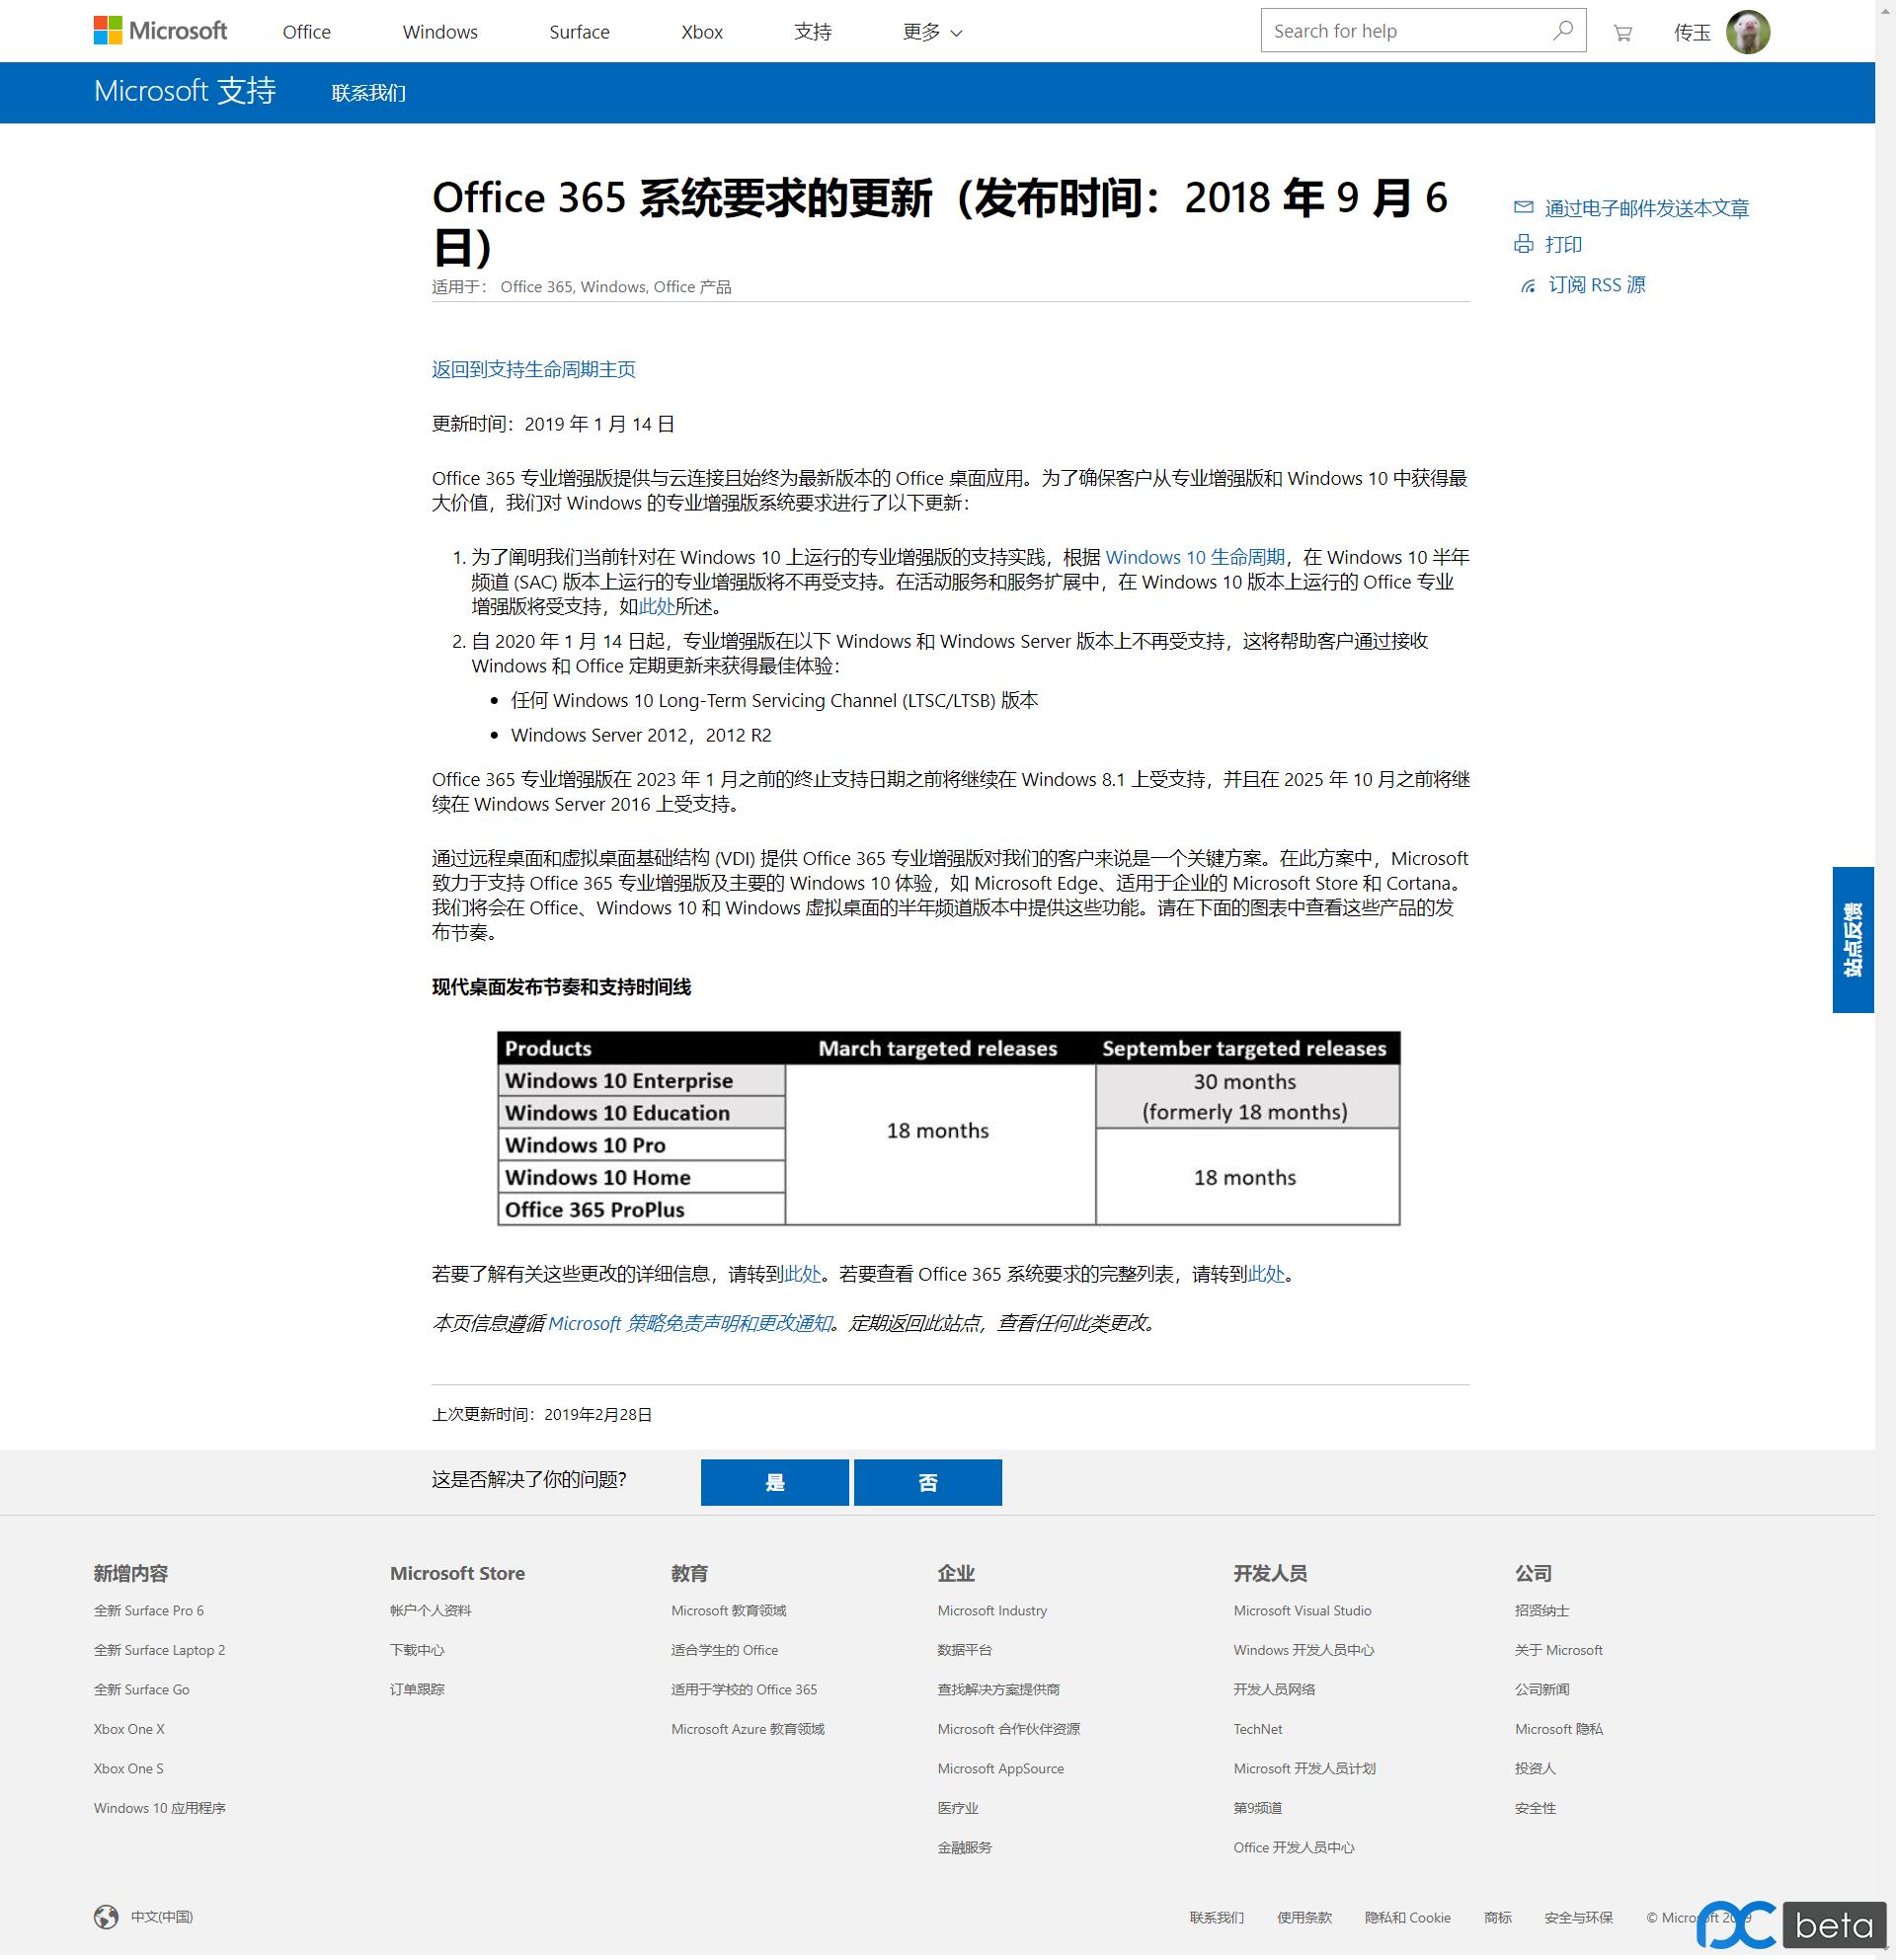 Office 365 系统要求的更新.png